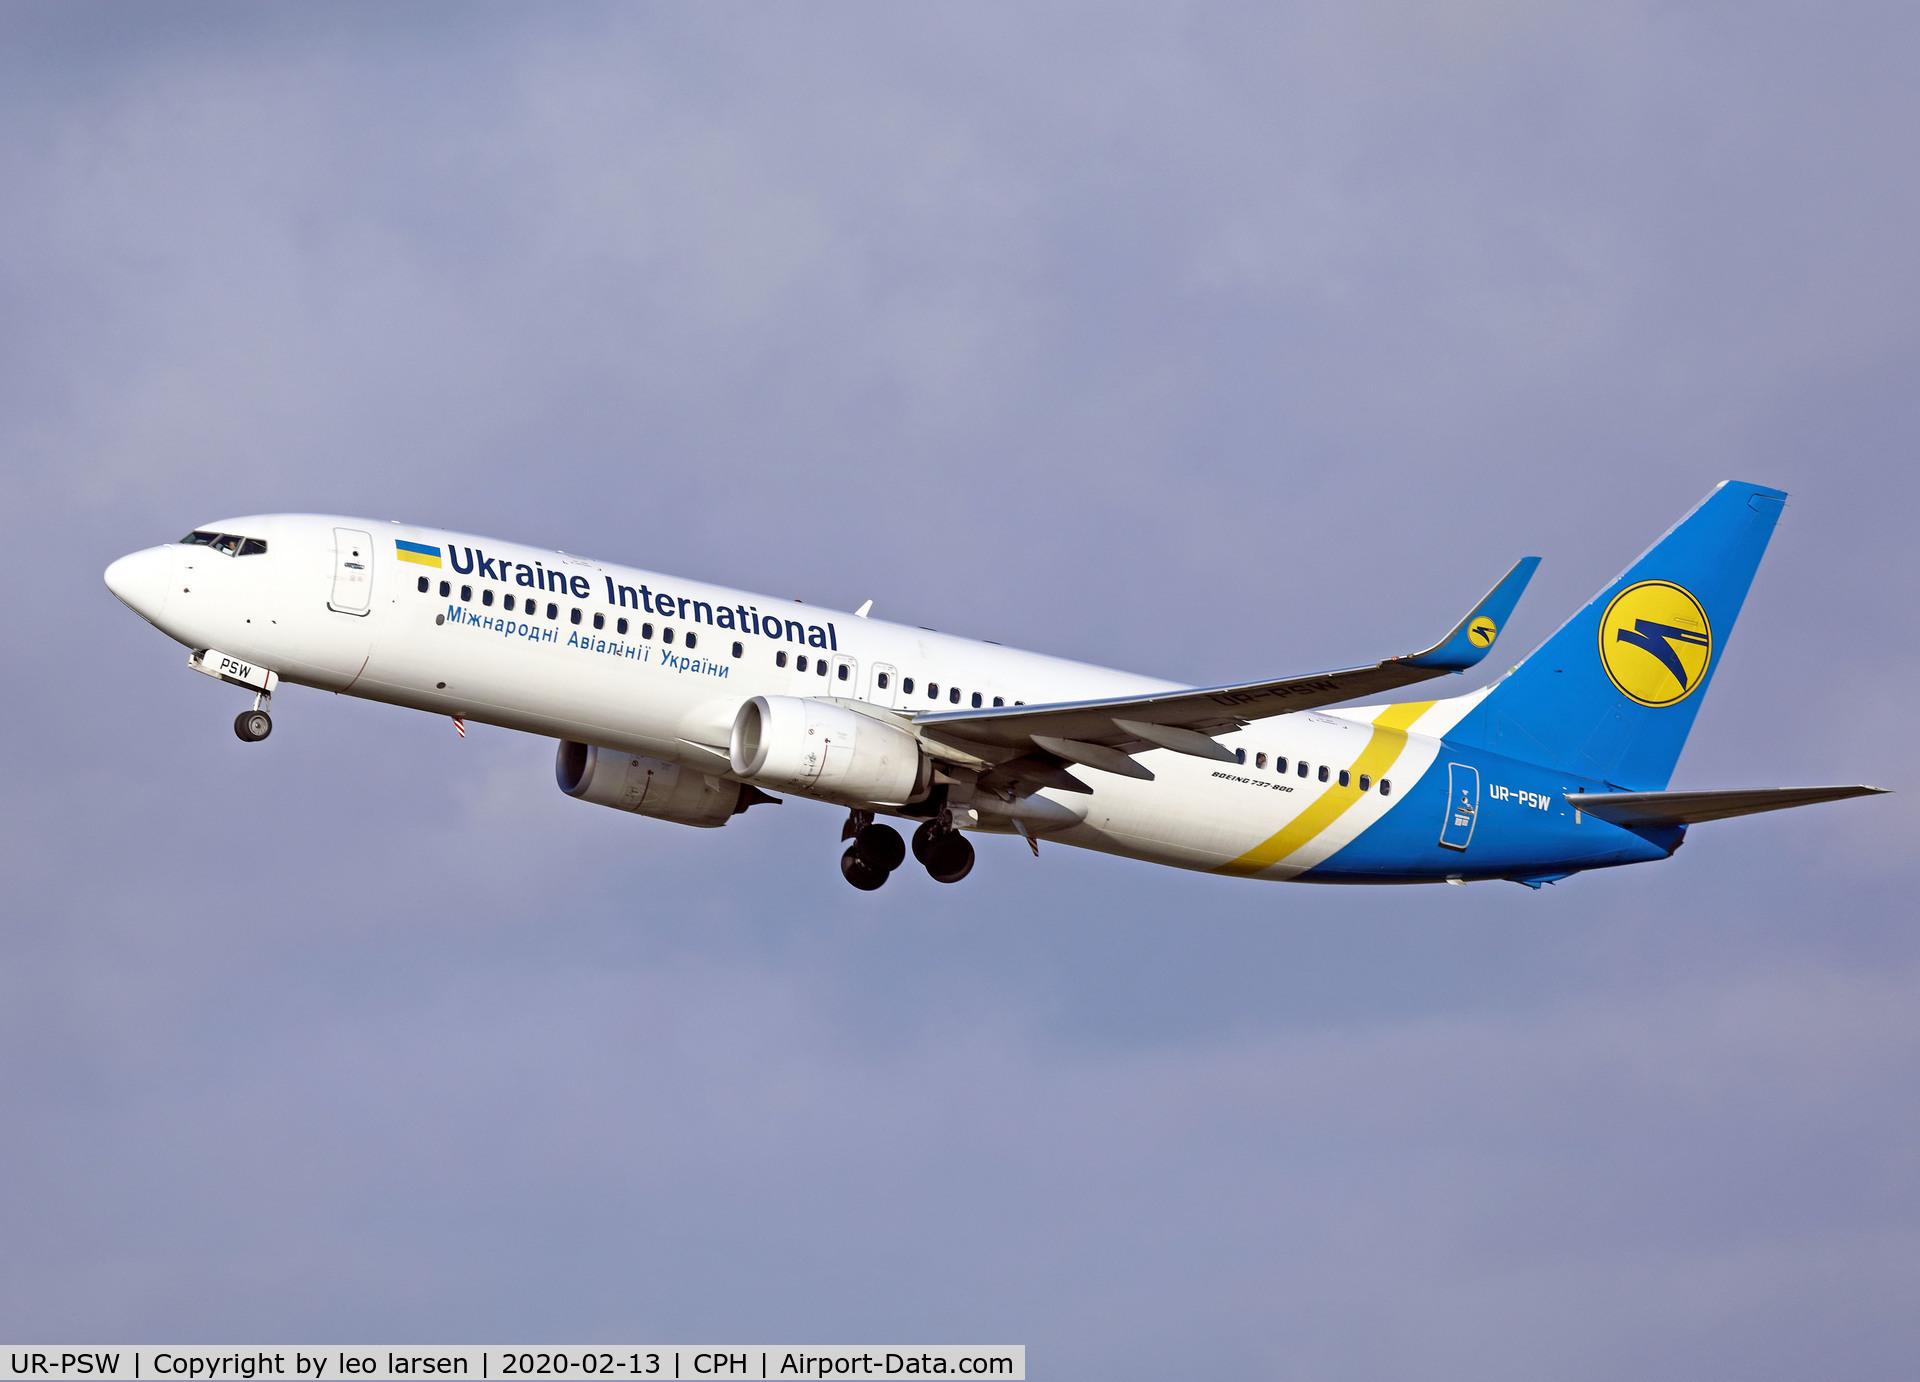 UR-PSW, 2017 Boeing 737-8KV C/N 41536, Copenhagen 13.2.2020